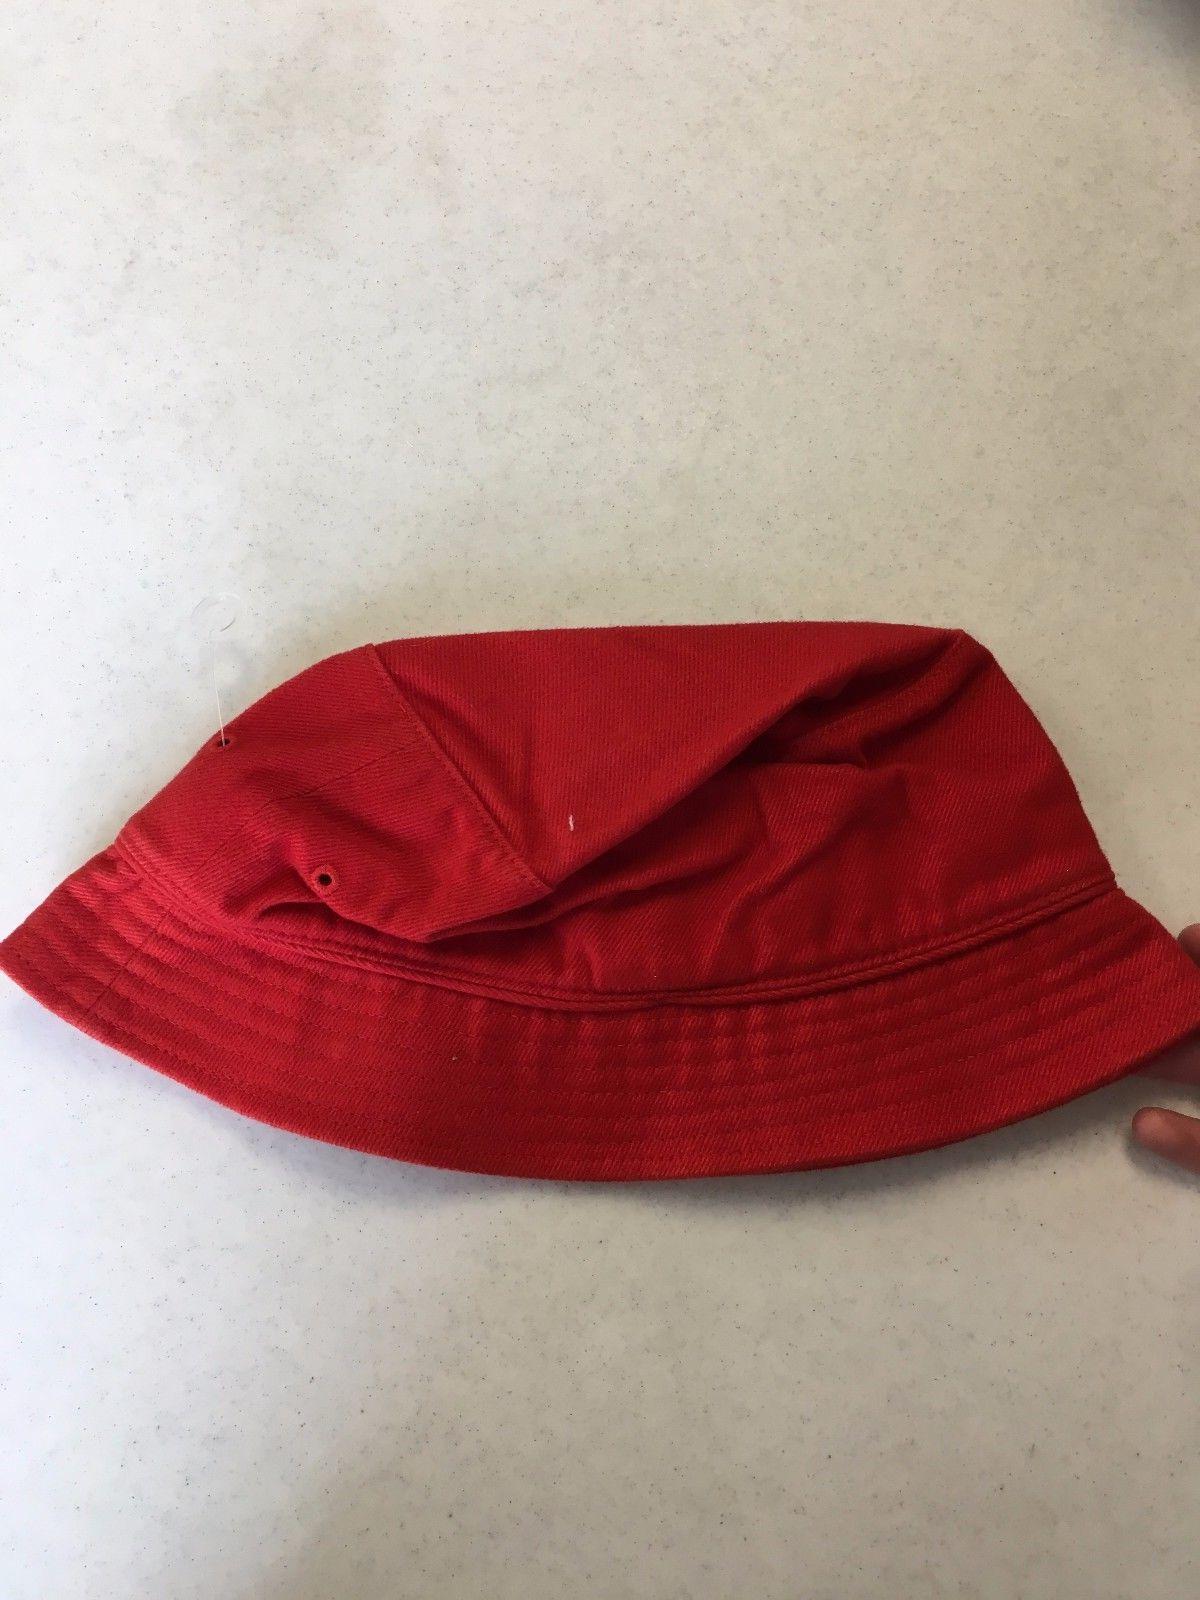 BRAND ADIDAS RED SQUARE BUCKET SMALL/MEDIUM FREE